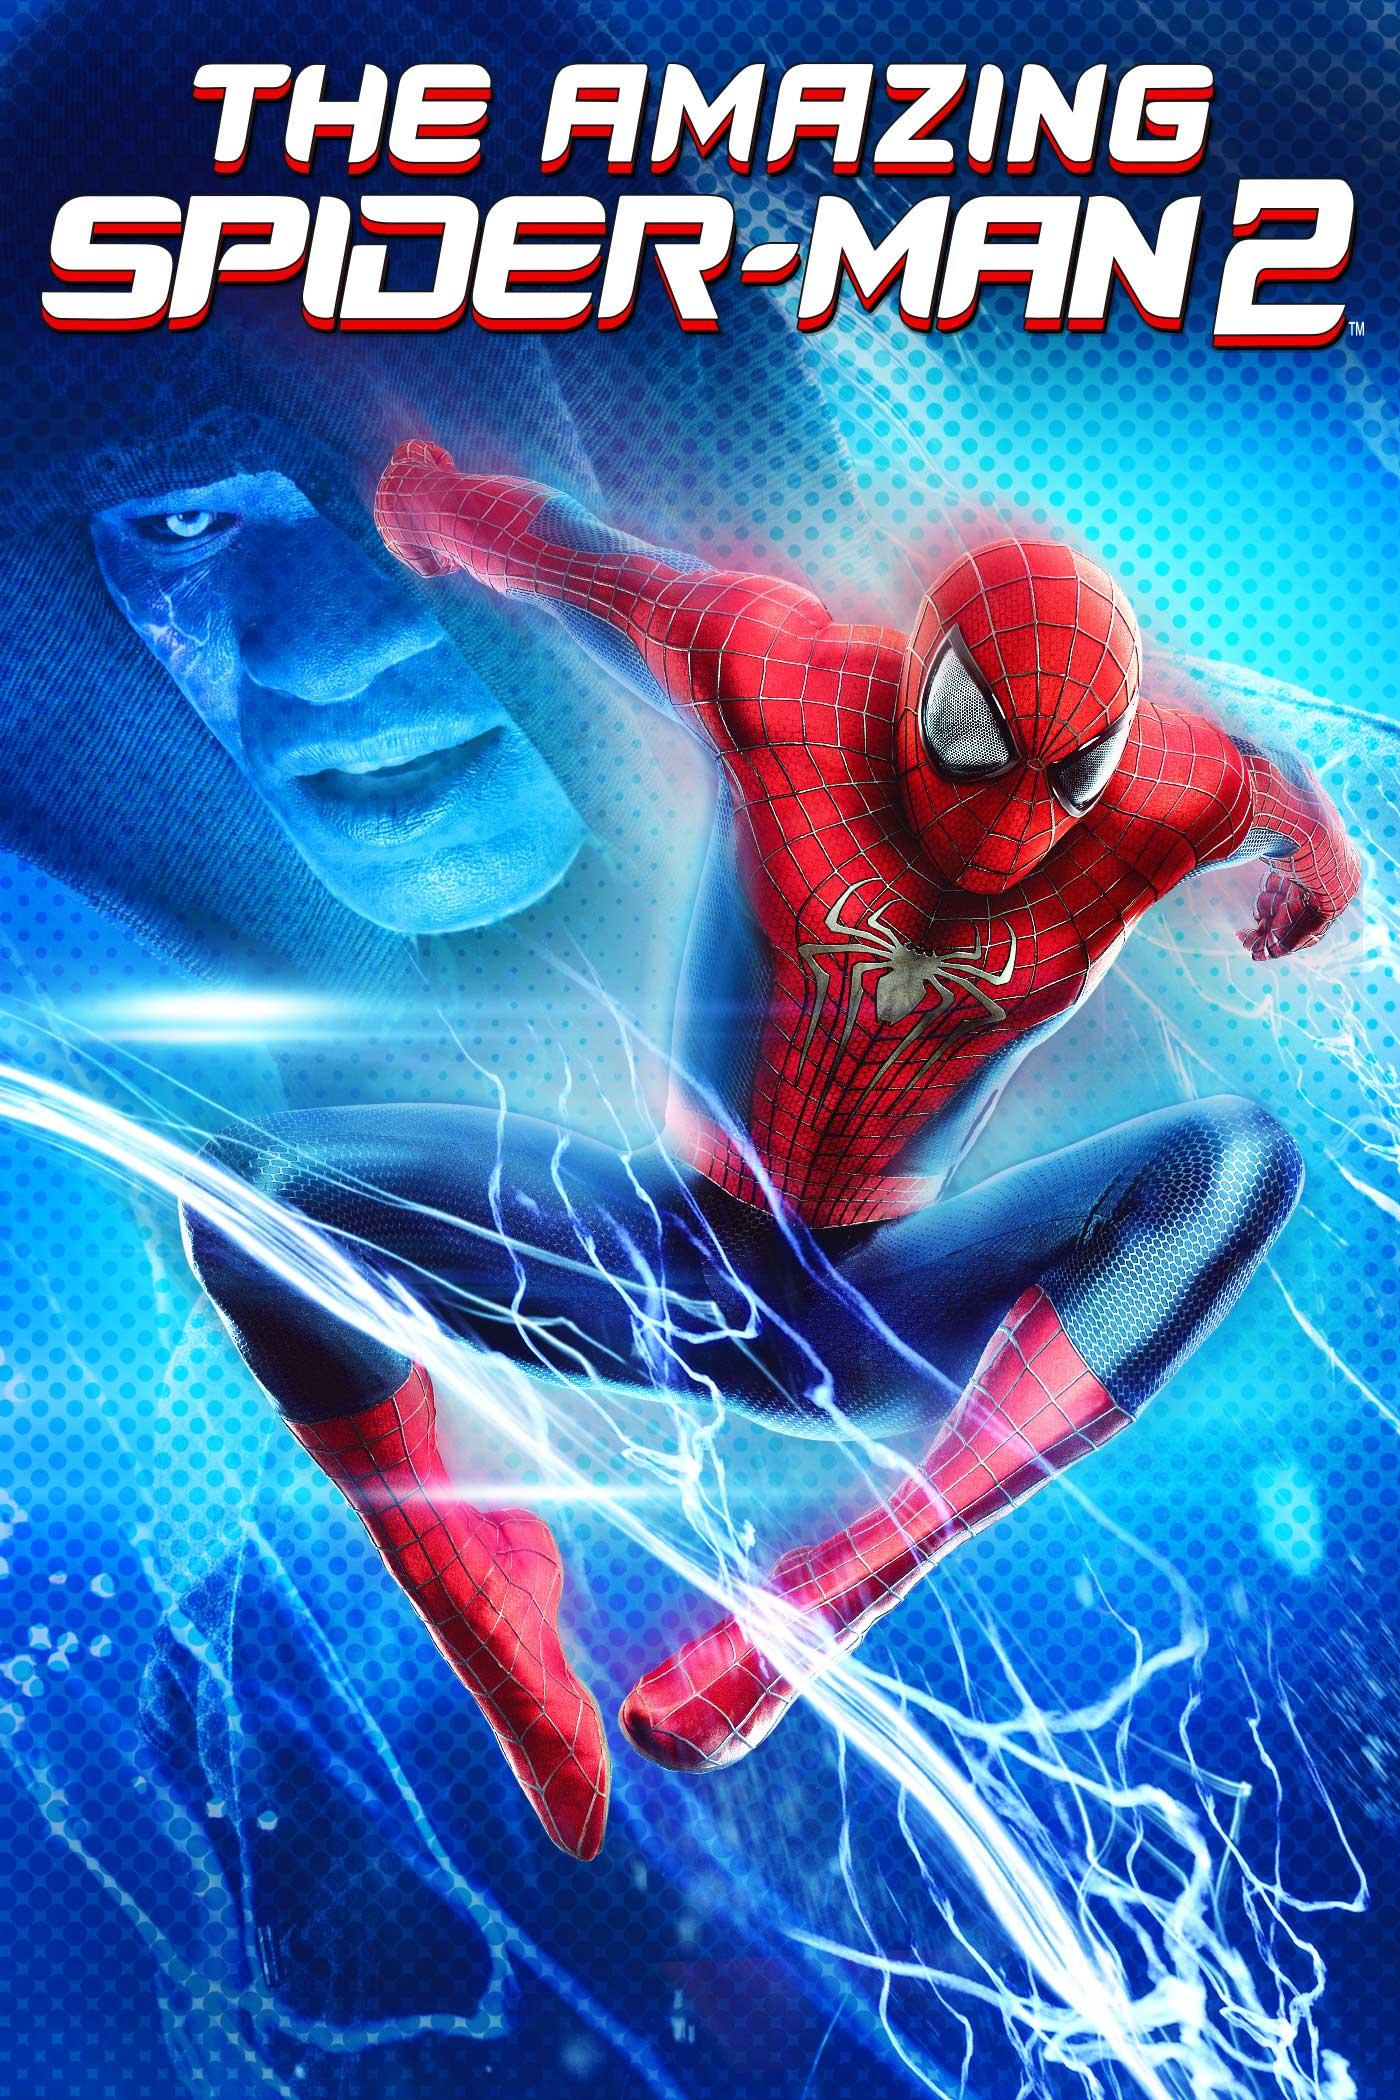 Man Youtube Makeup Gurus: Spider-Man 6 Film Collection HD